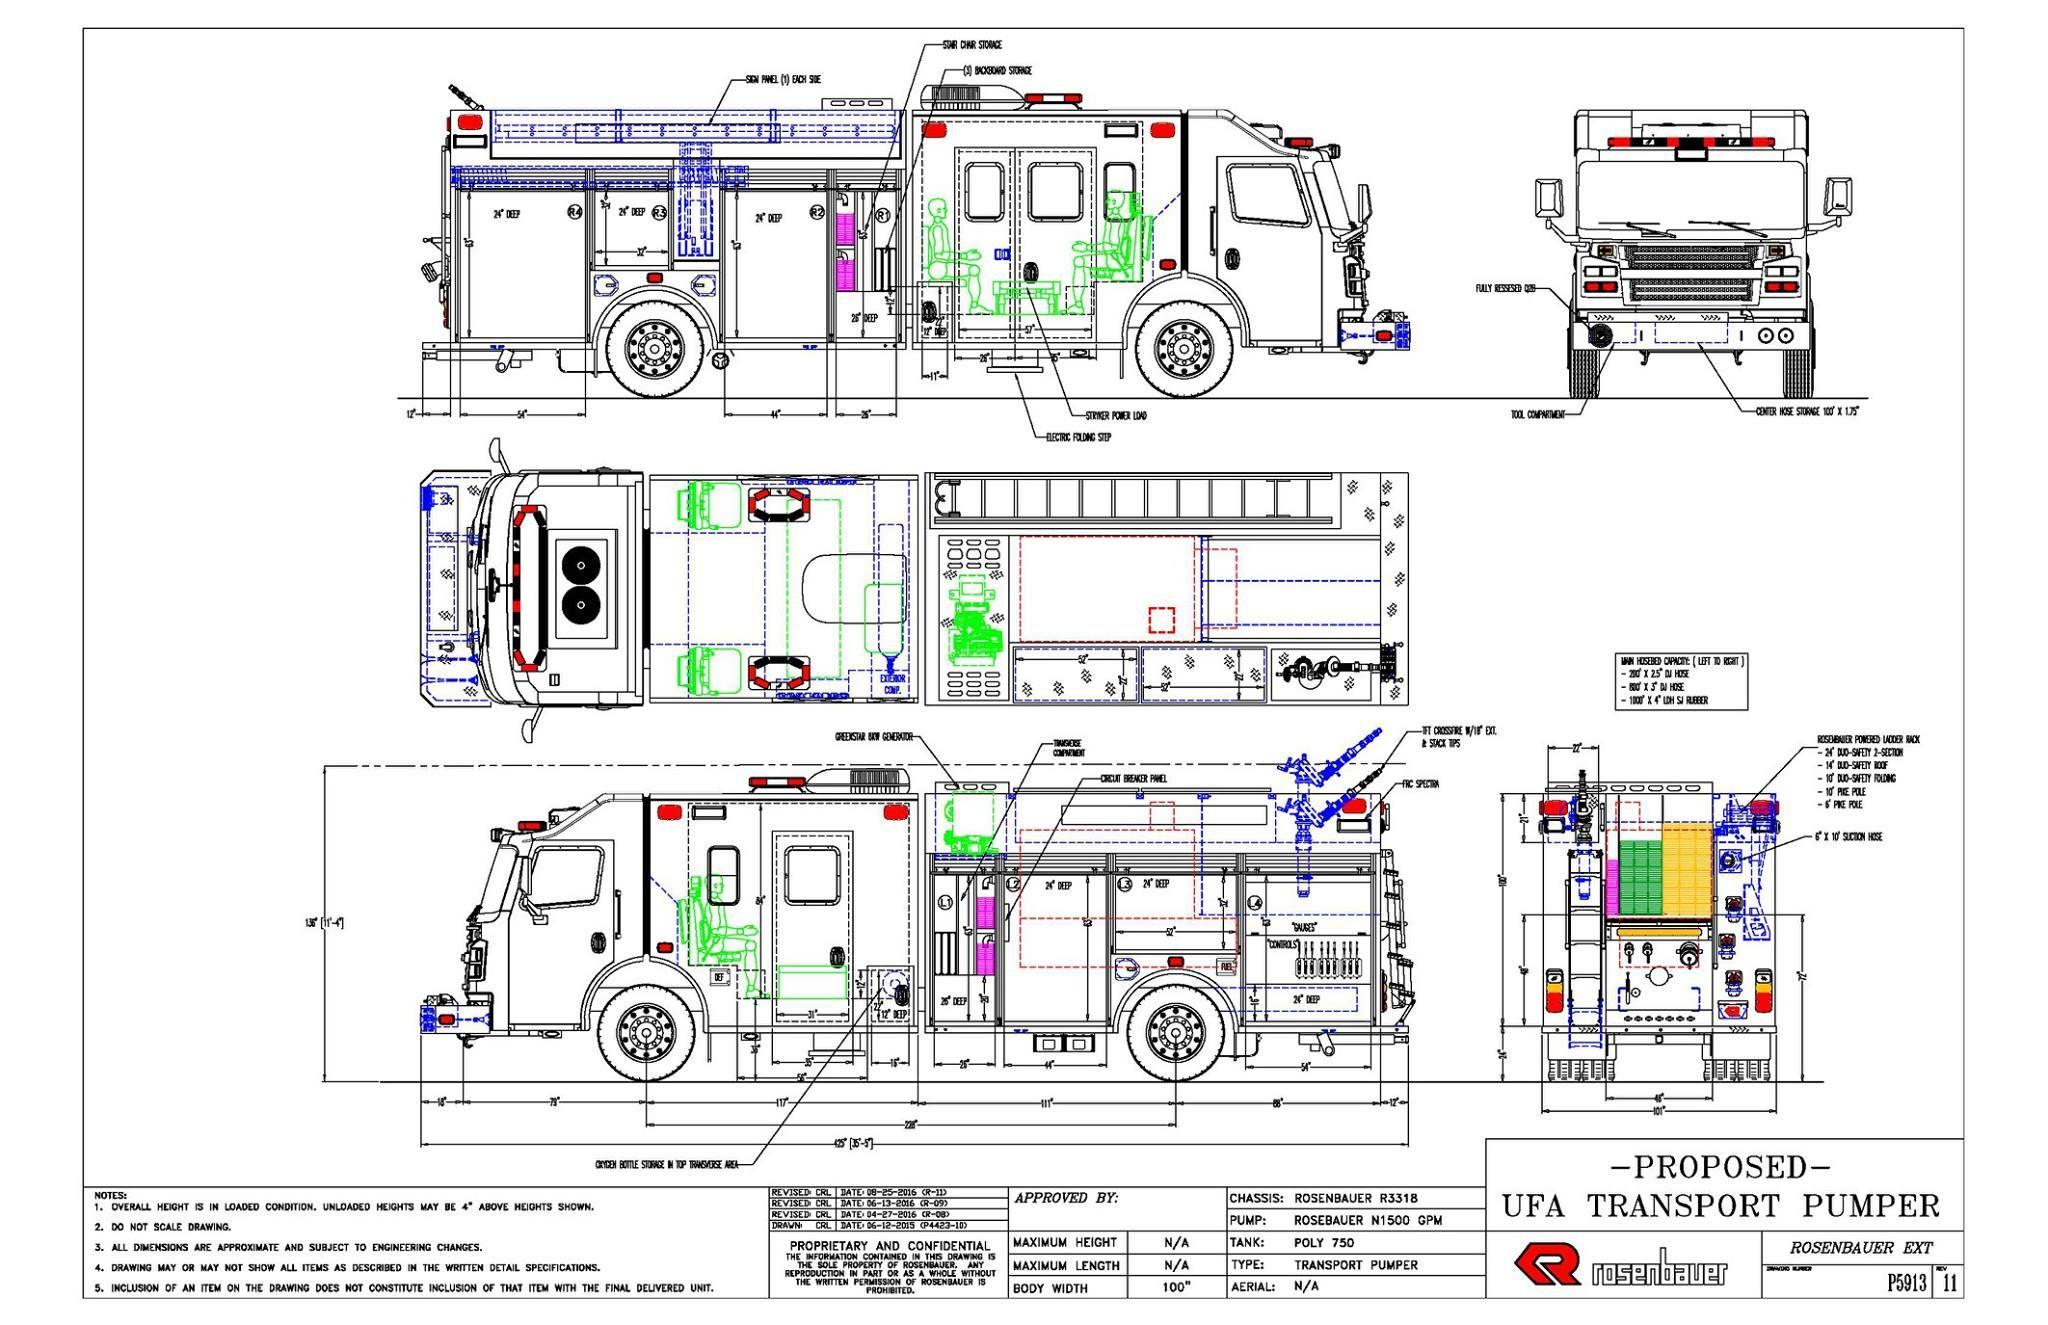 hight resolution of unified fire authority rosenbauer fire engine drawing fire engine fire trucks firefighter fire